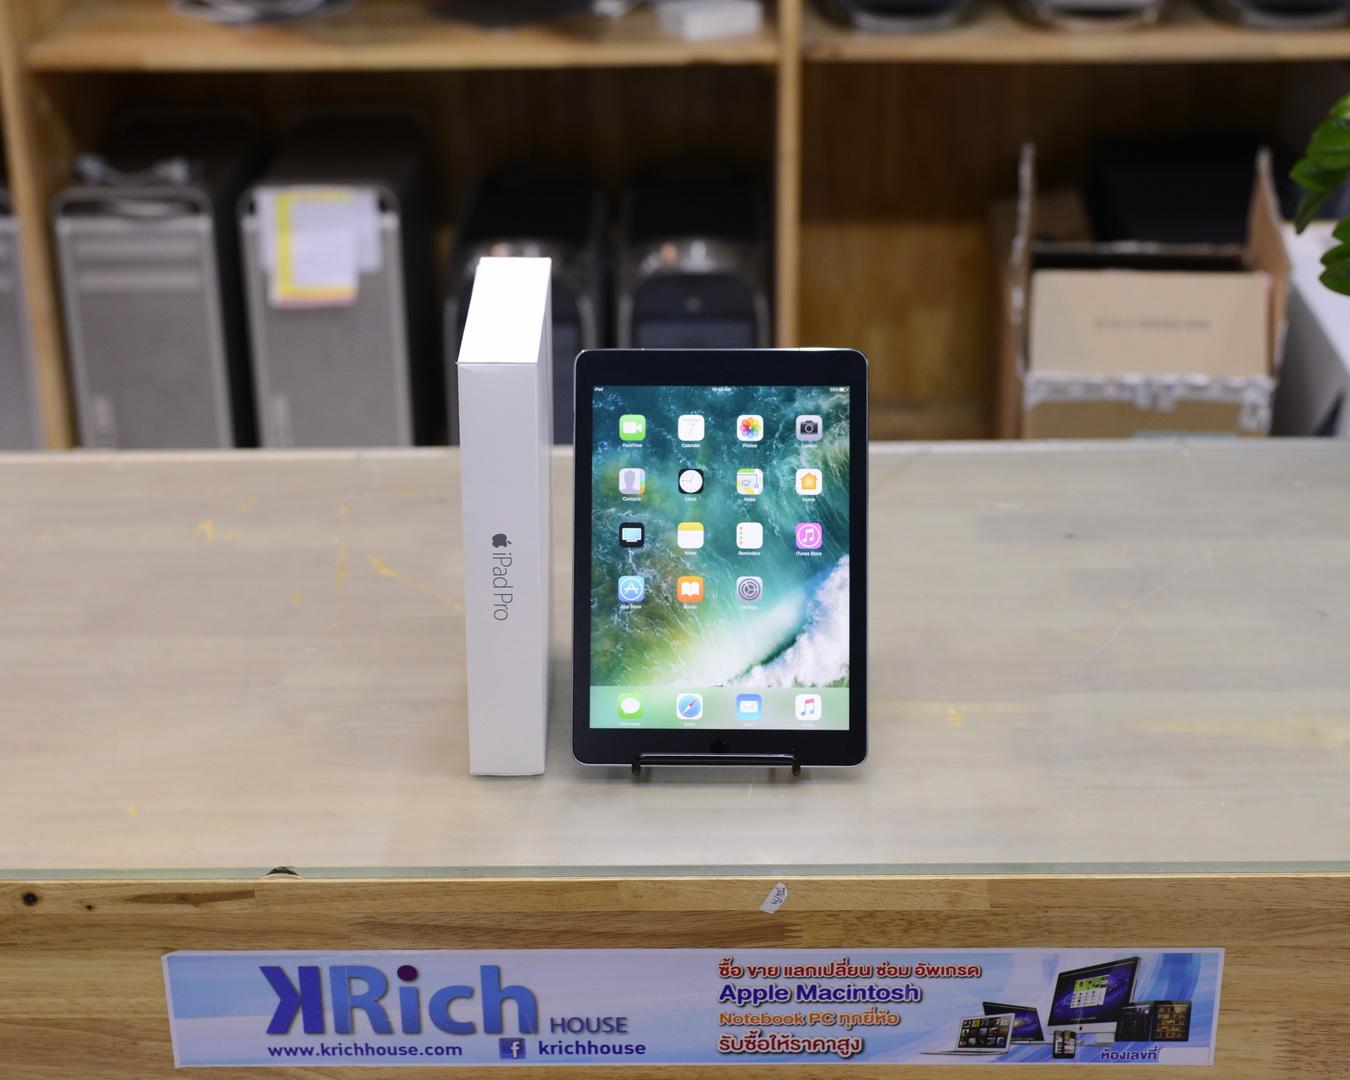 iPad Pro 9.7-inch 128GB Wi-Fi + Cellular, Space Gray - Fullbox - Apple Warranty 30/03/2018